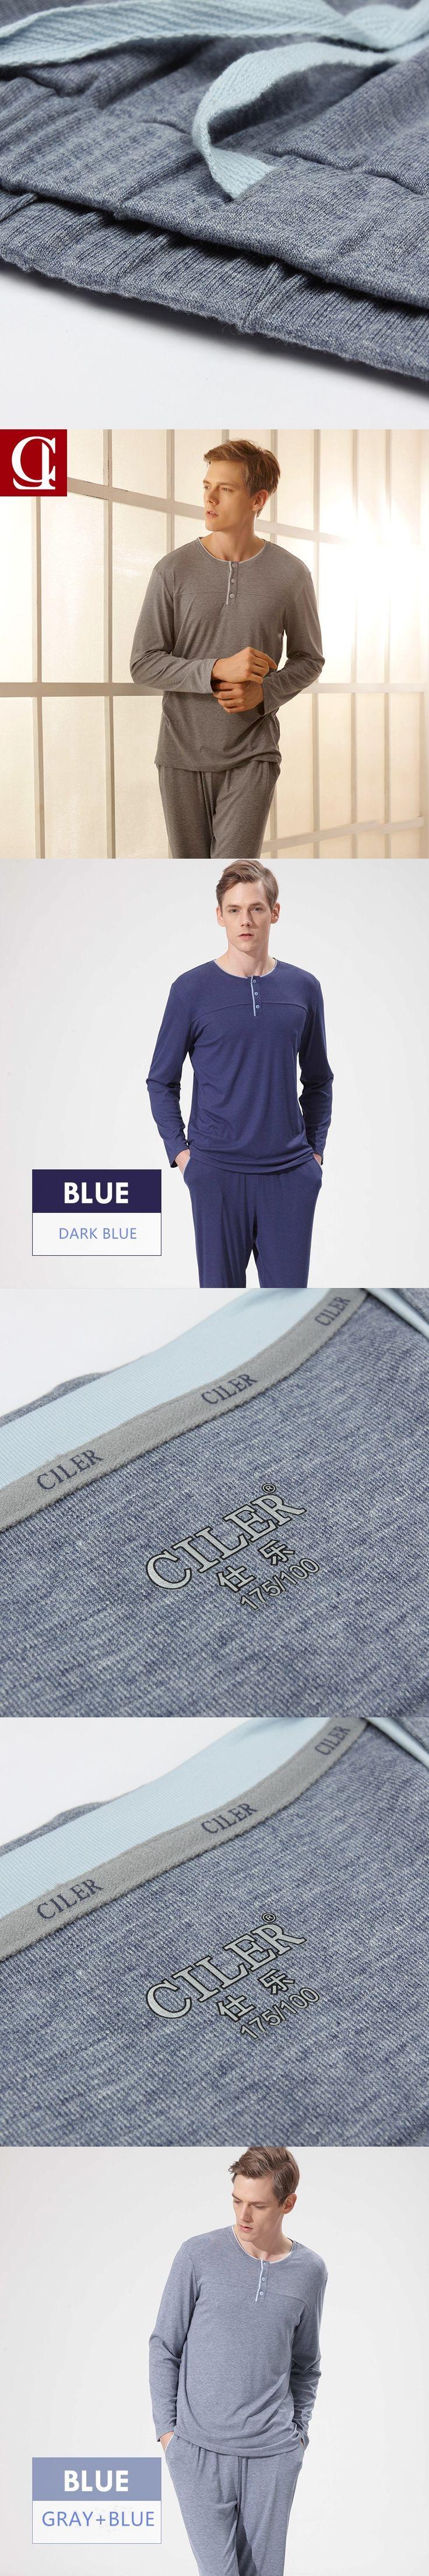 CILER 2017 Men Long Sleeve 66% Viscose Pajamas Set Casual Button sleepwear tshirt pants Suit Male Big Size Lingerie pijama homme